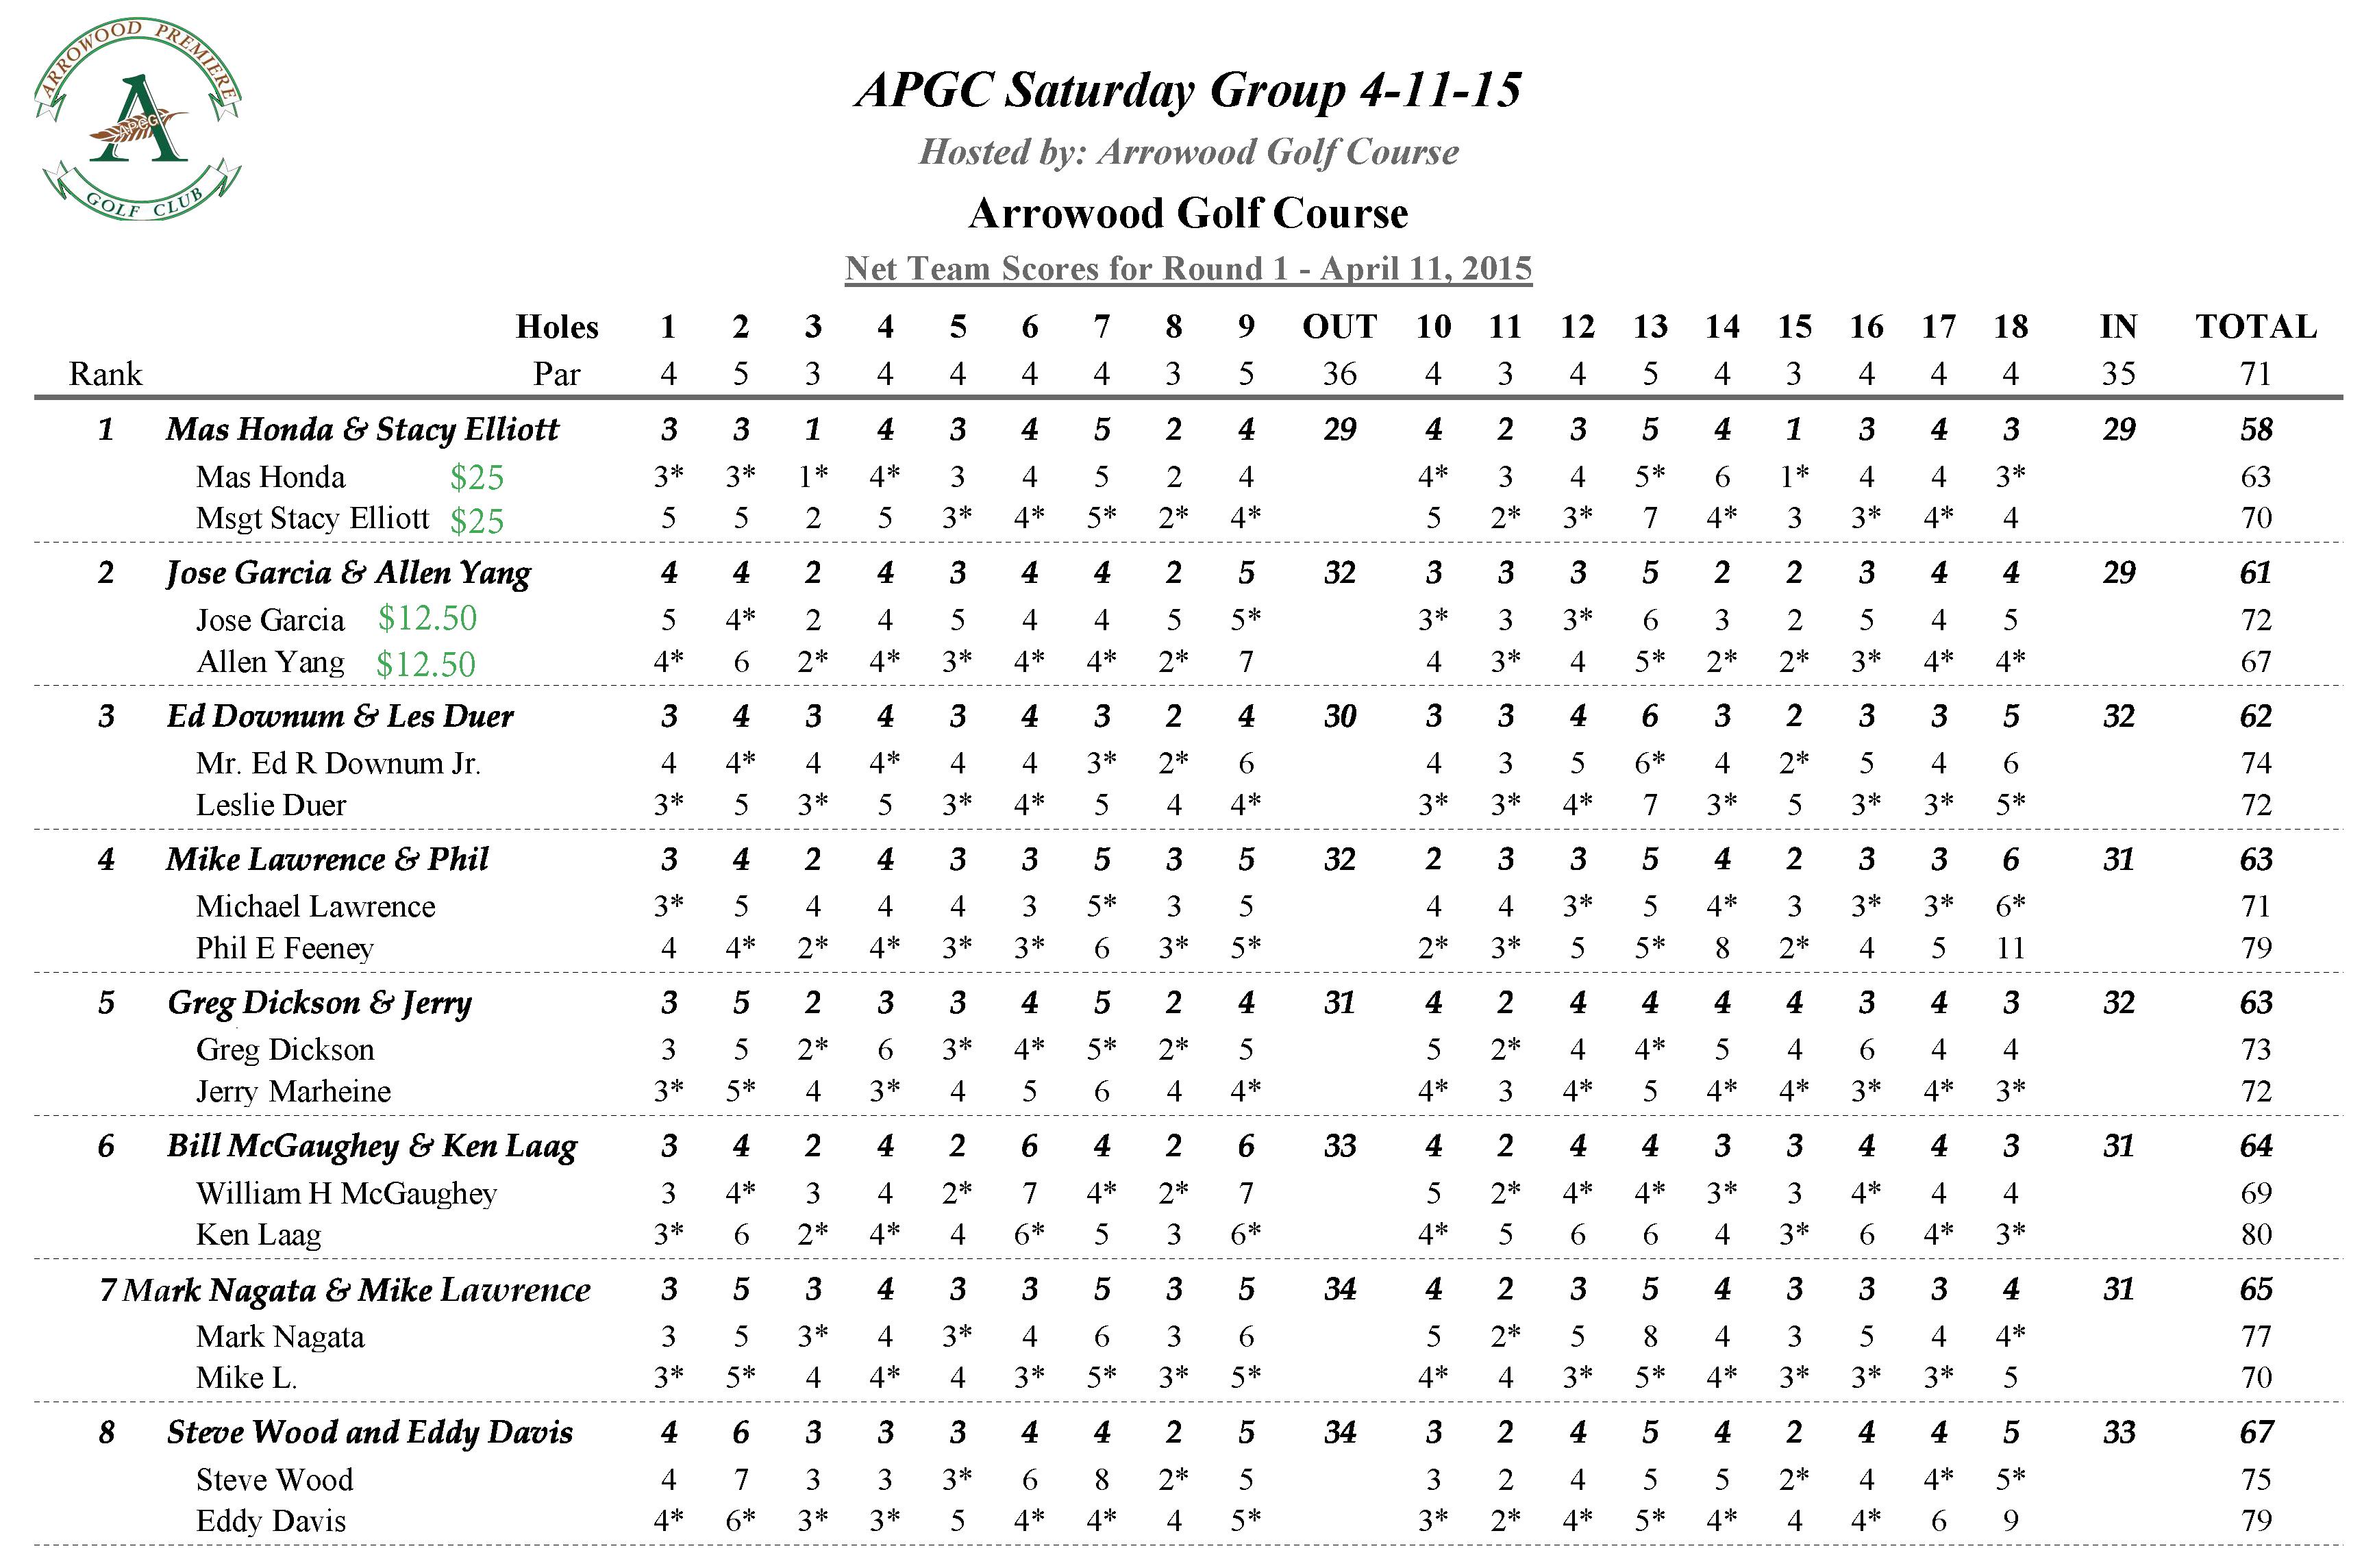 APGC Saturday 4-11-15